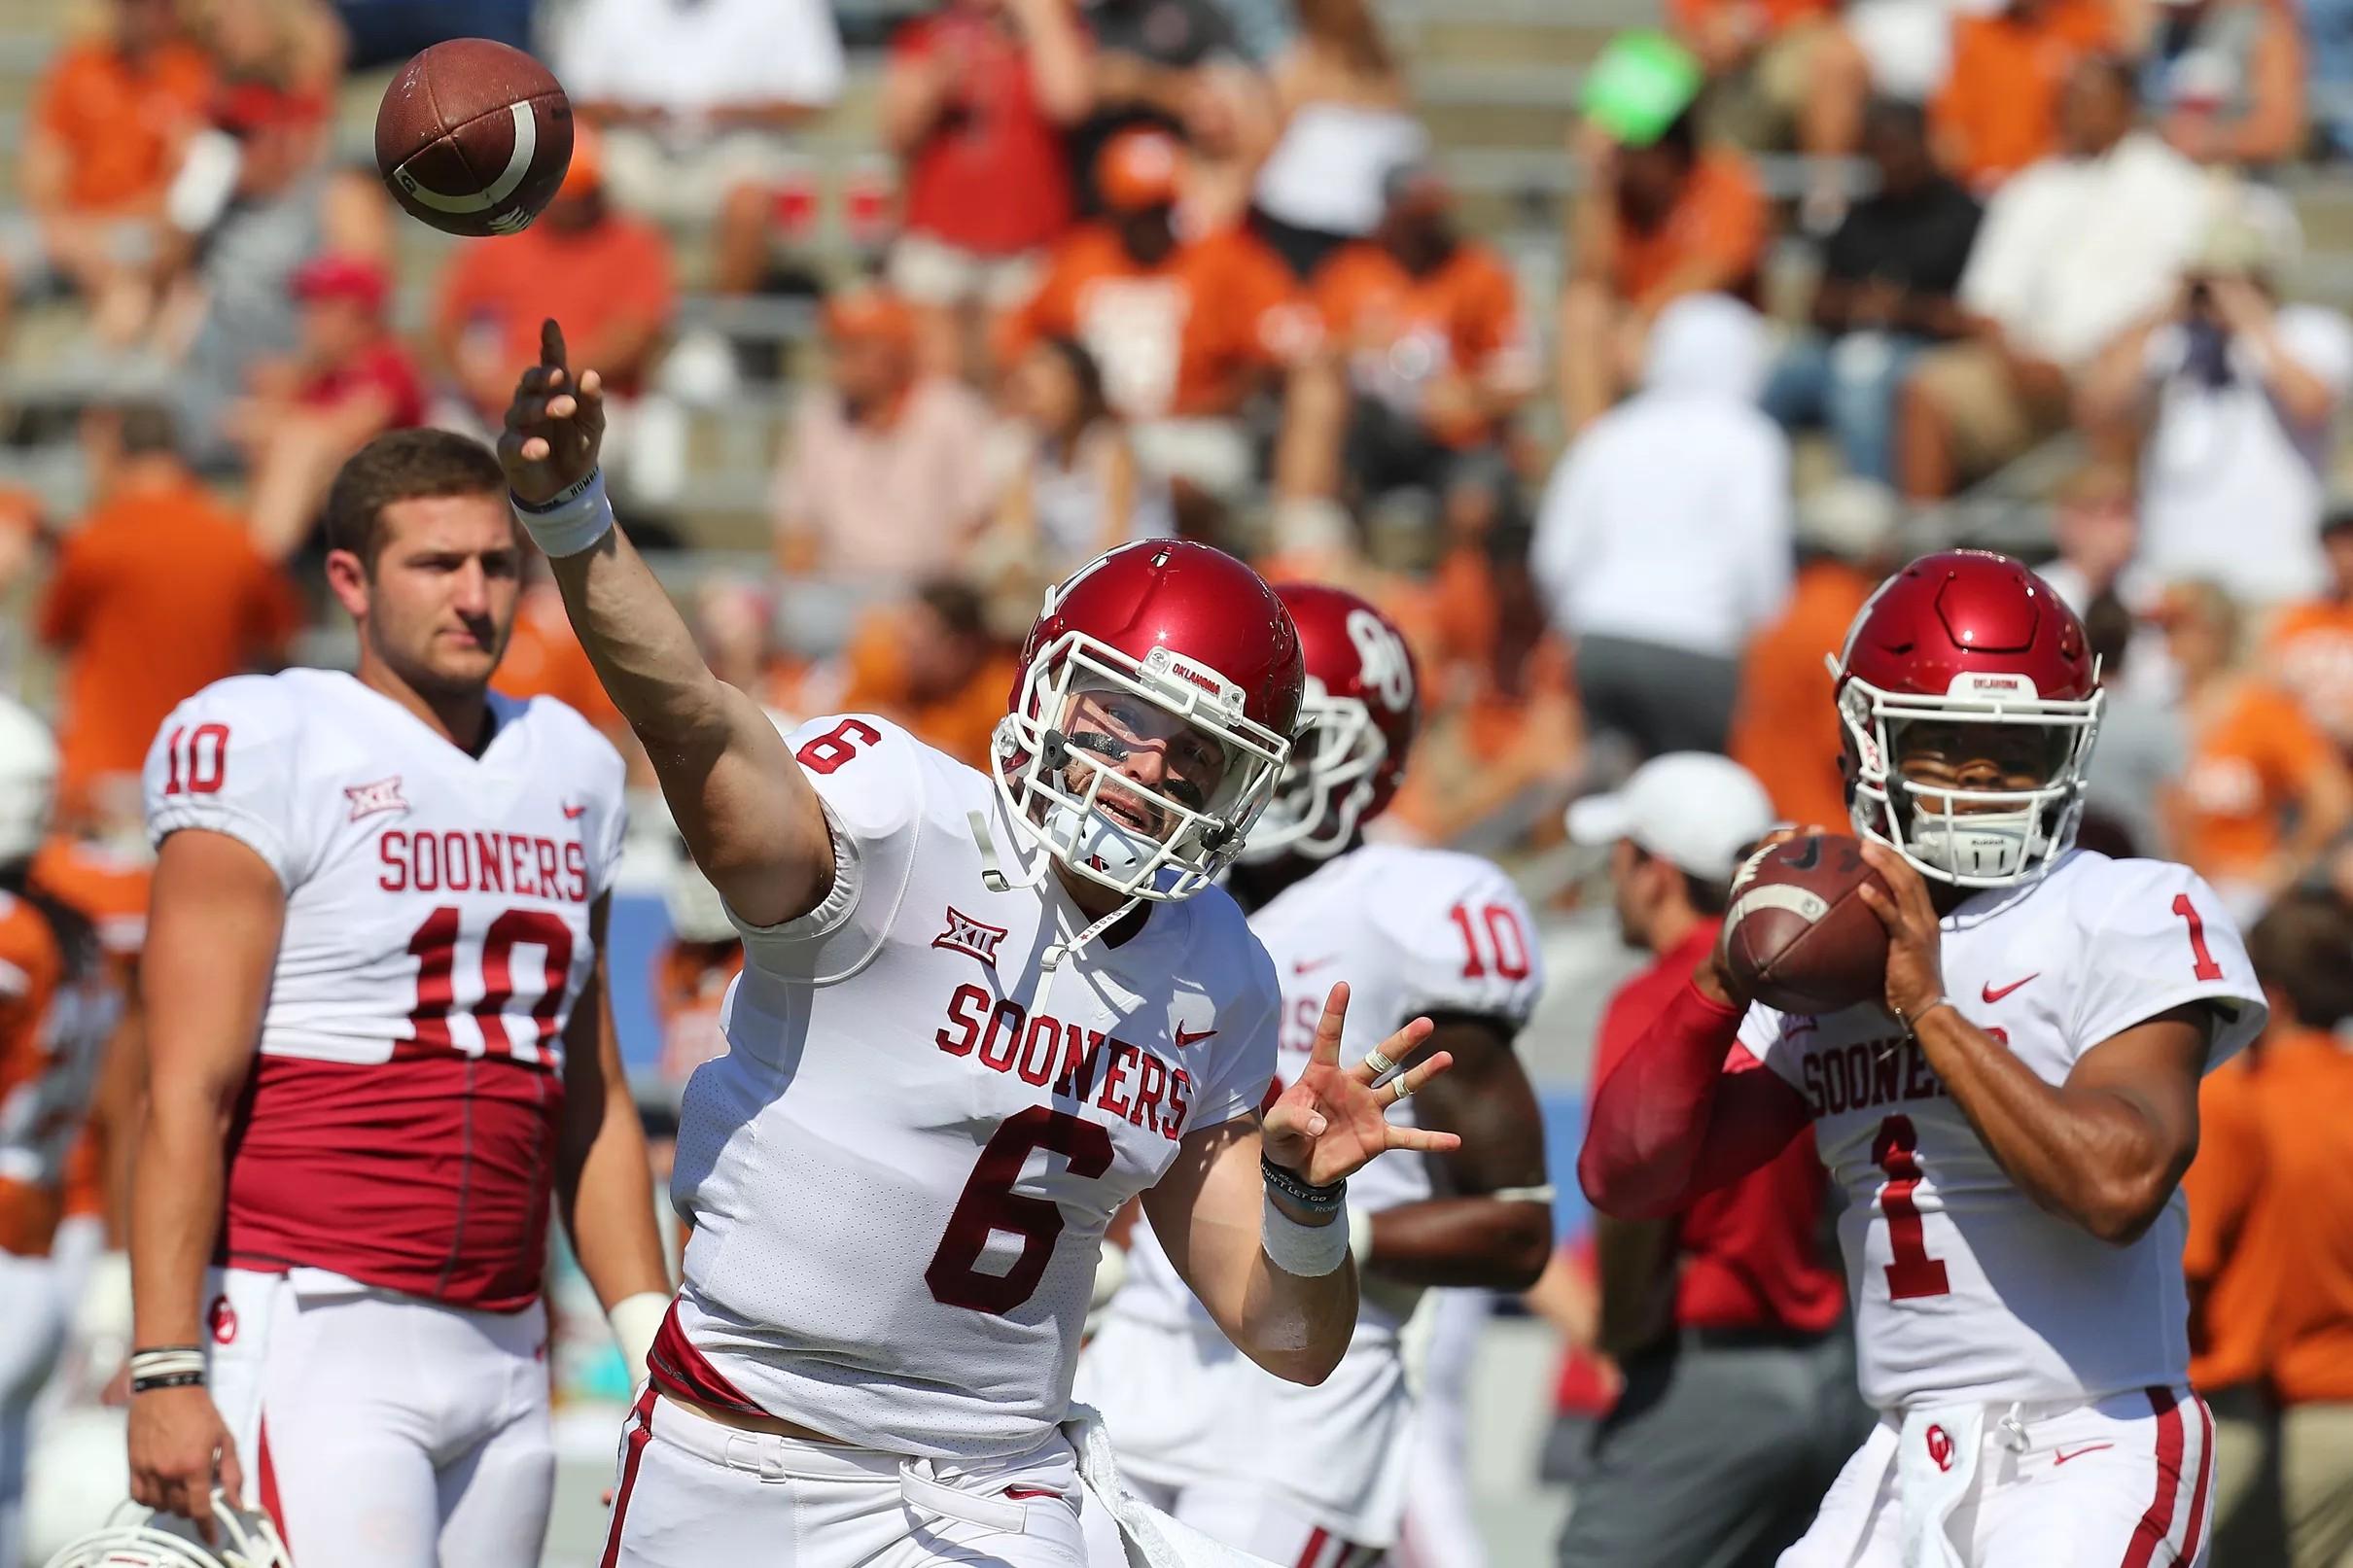 d5f24eabf66 Oklahoma Sooners Football Hot Links: Transfers, NCAA Super Regionals and Baker  Mayfield